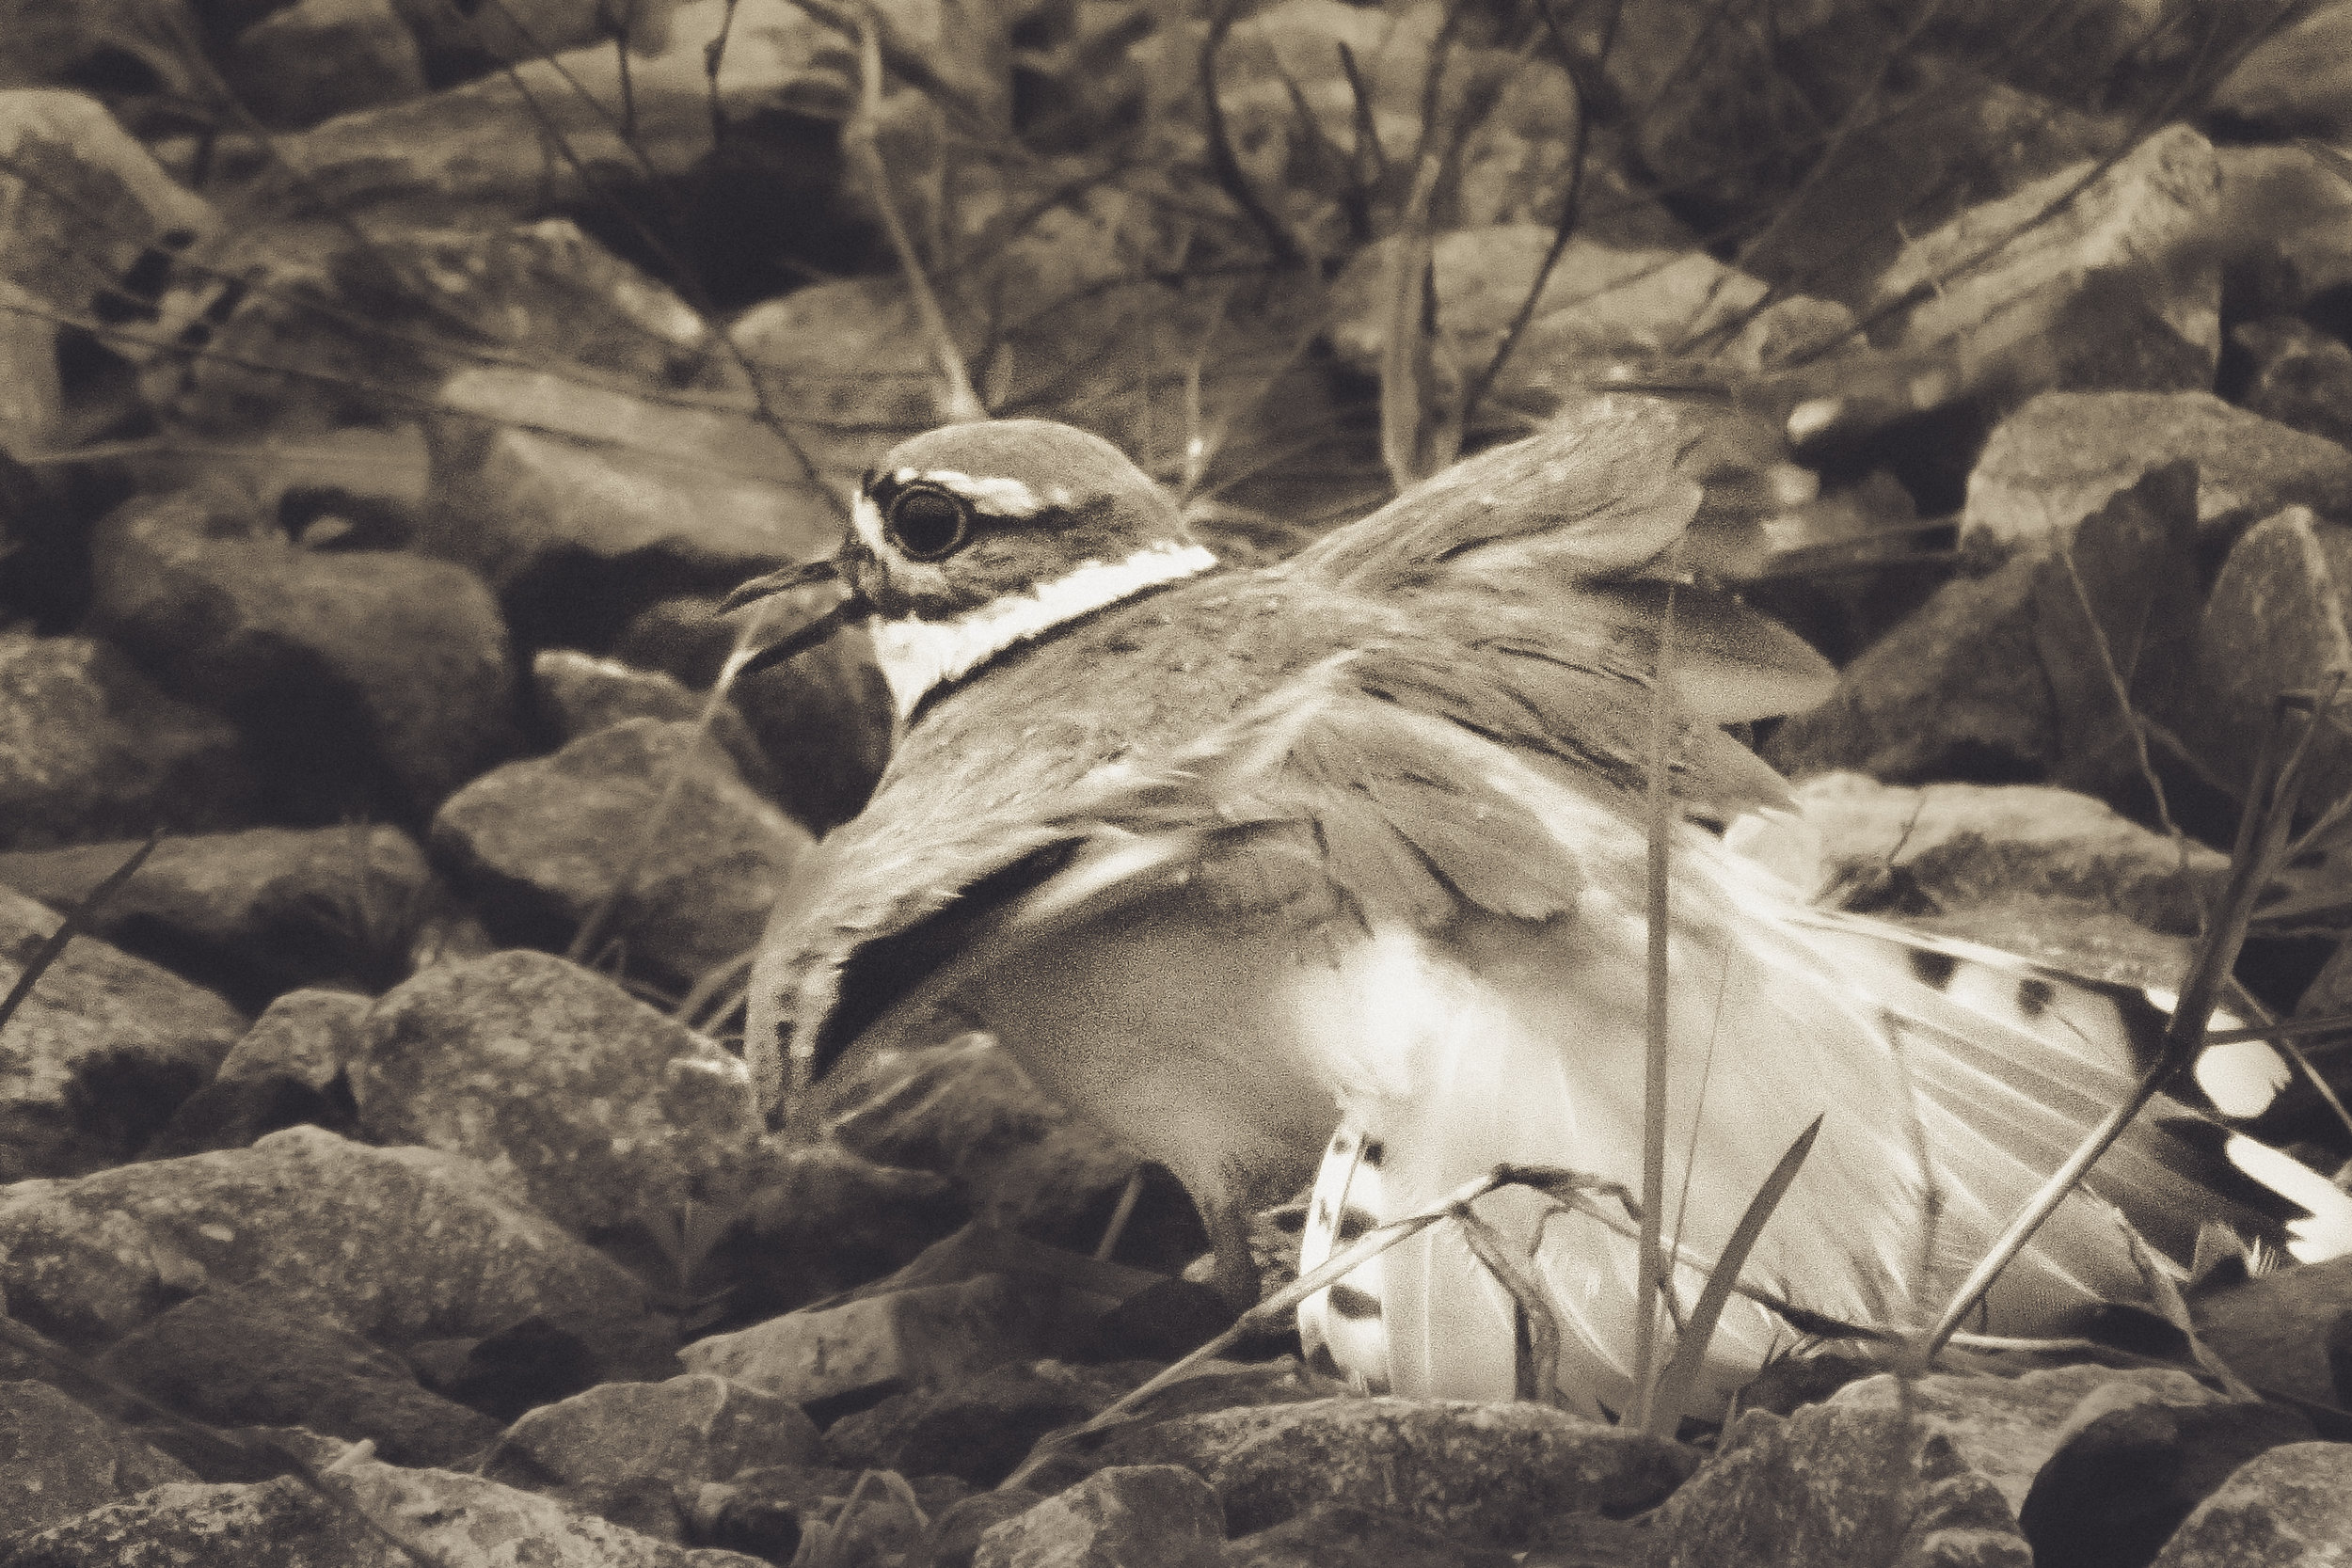 Killdeer Feigning Broken Wings to Draw Predators Away from Her Eggs Photo: Rose Anderson, 2012